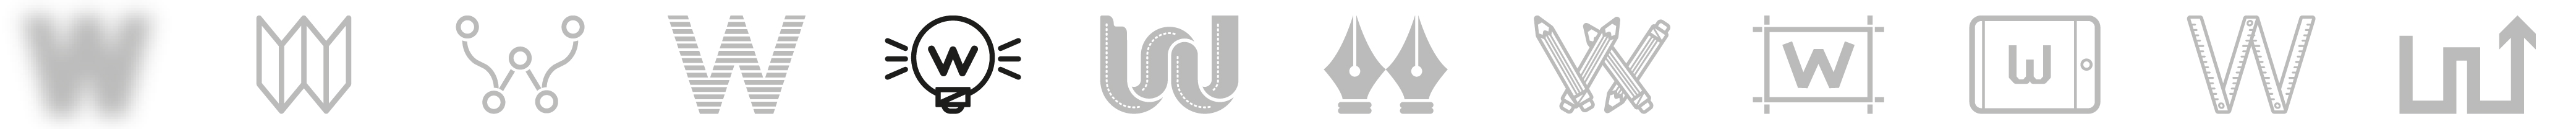 housatonic-01